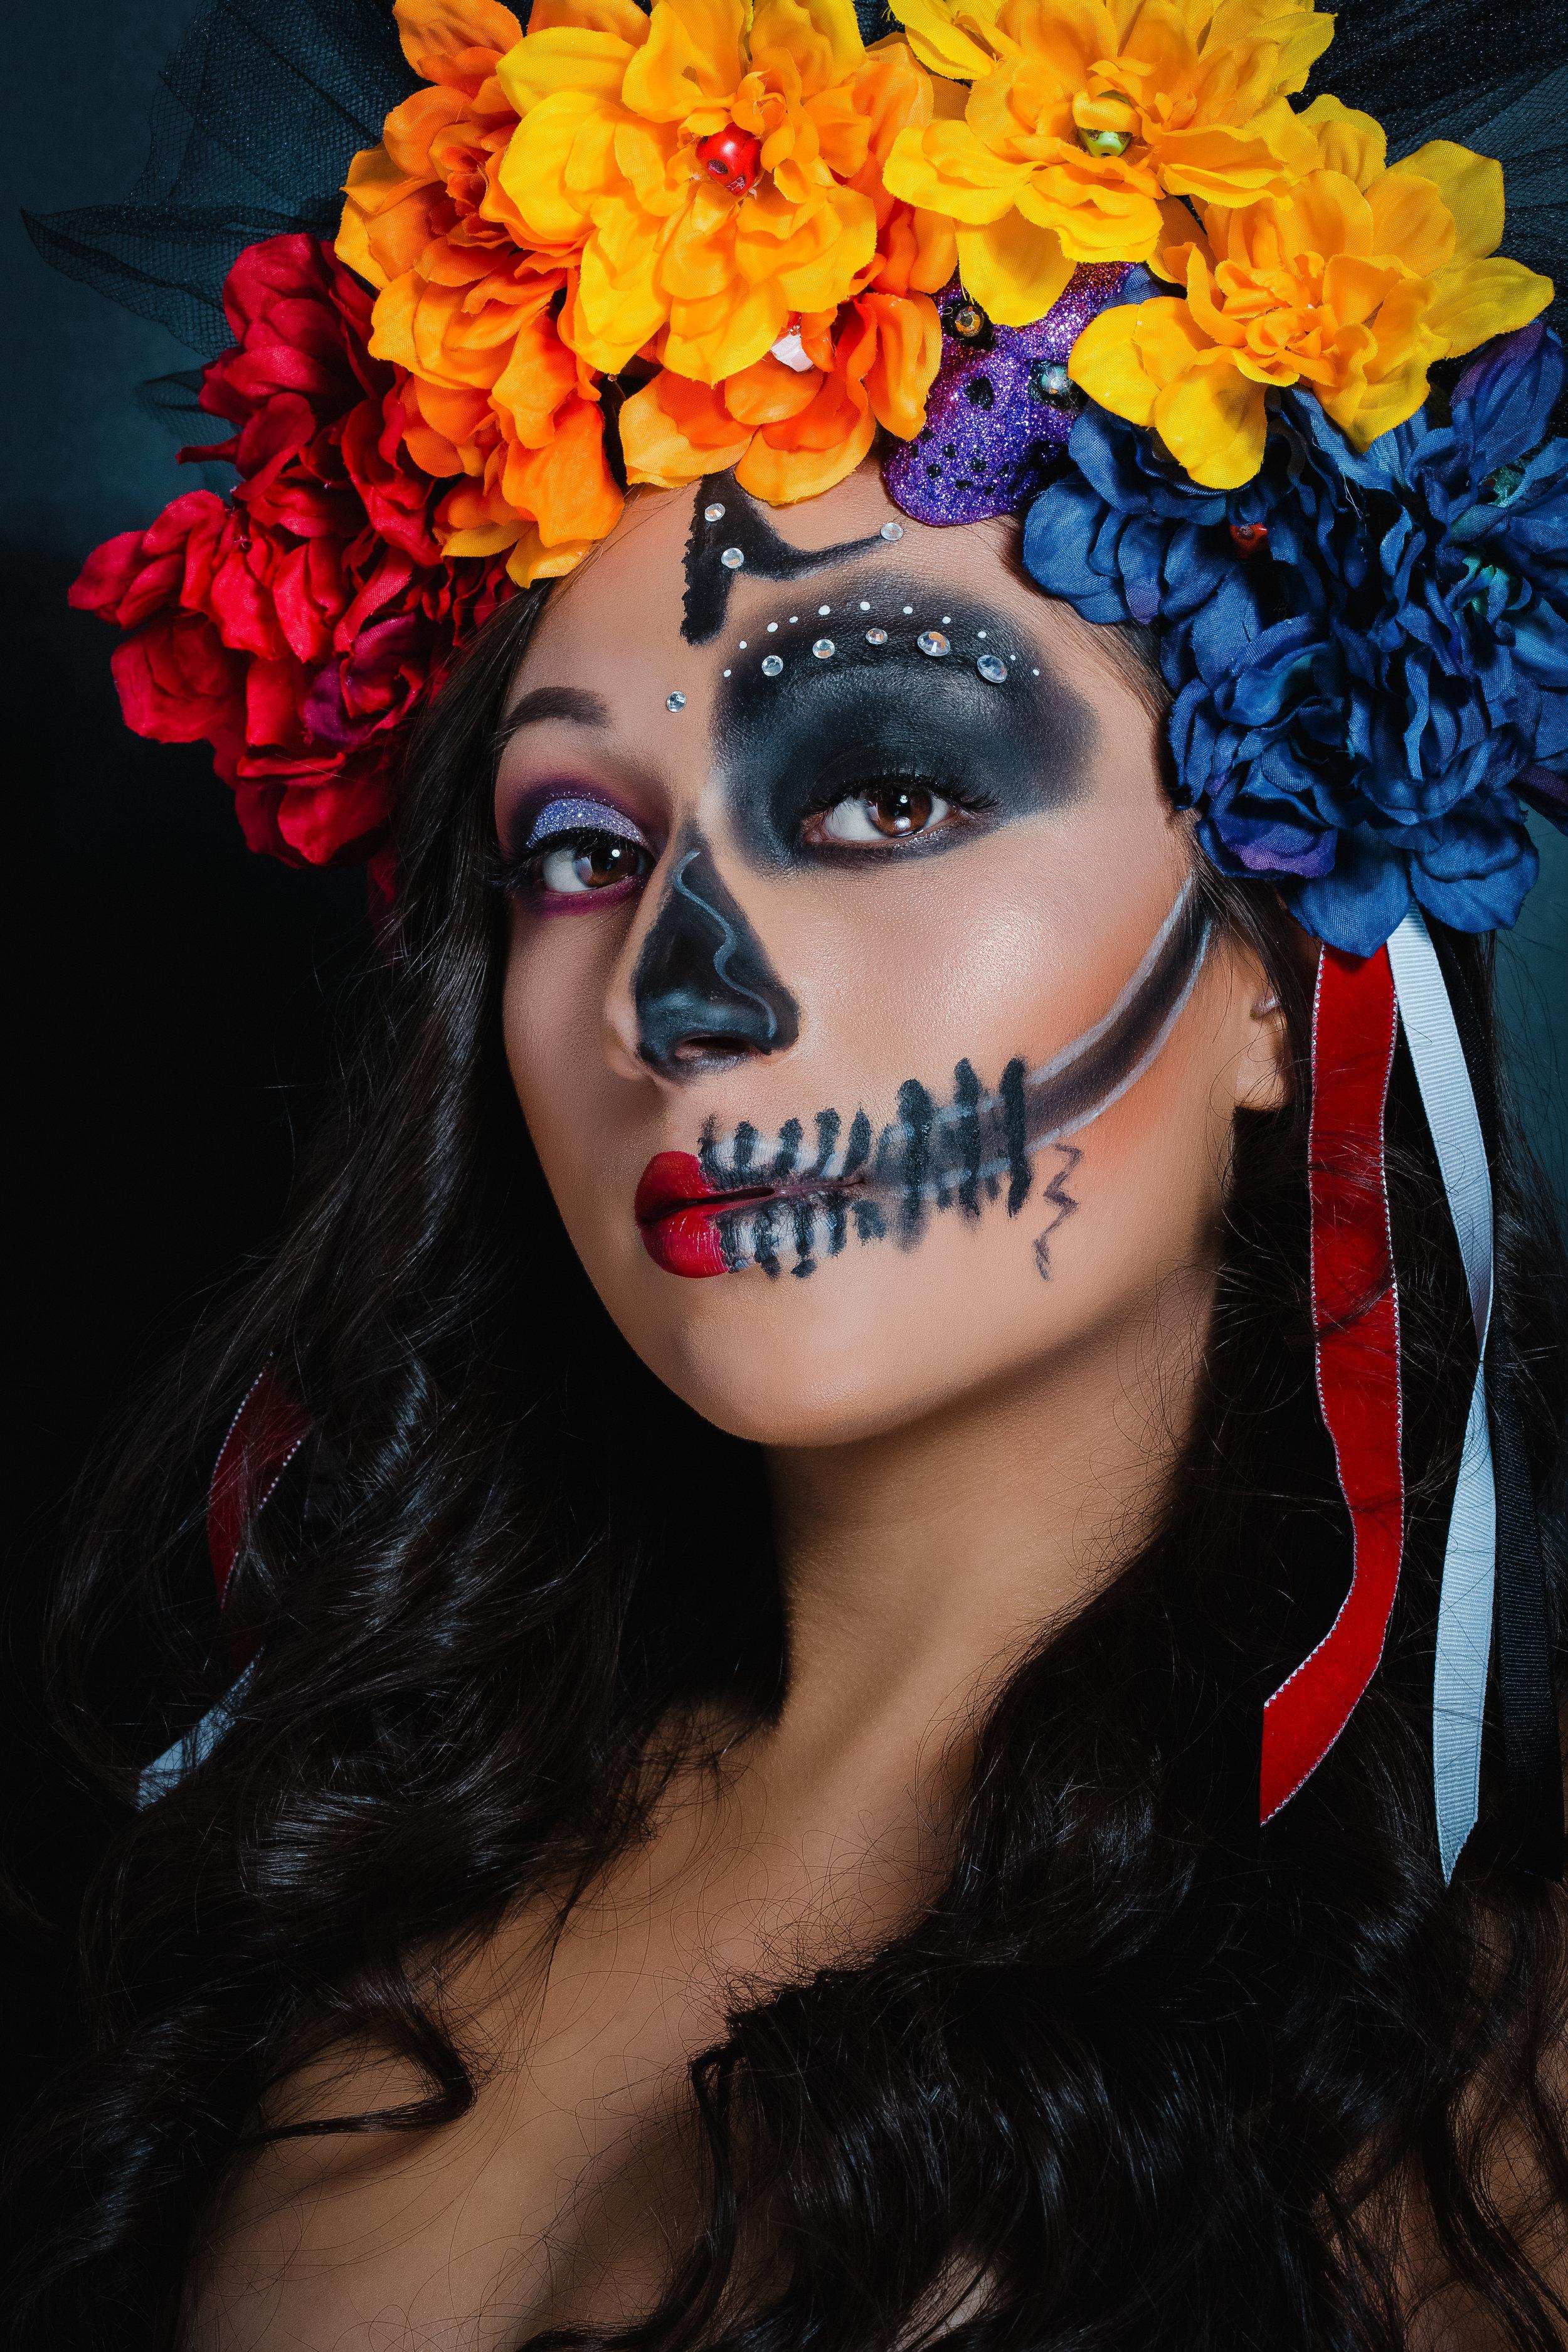 Photographer: @jachristo /Retoucher: @luisparradesign   Makeup: @mua.lay   Model: @dmoney_recordsss   Text: Melissa Borrego